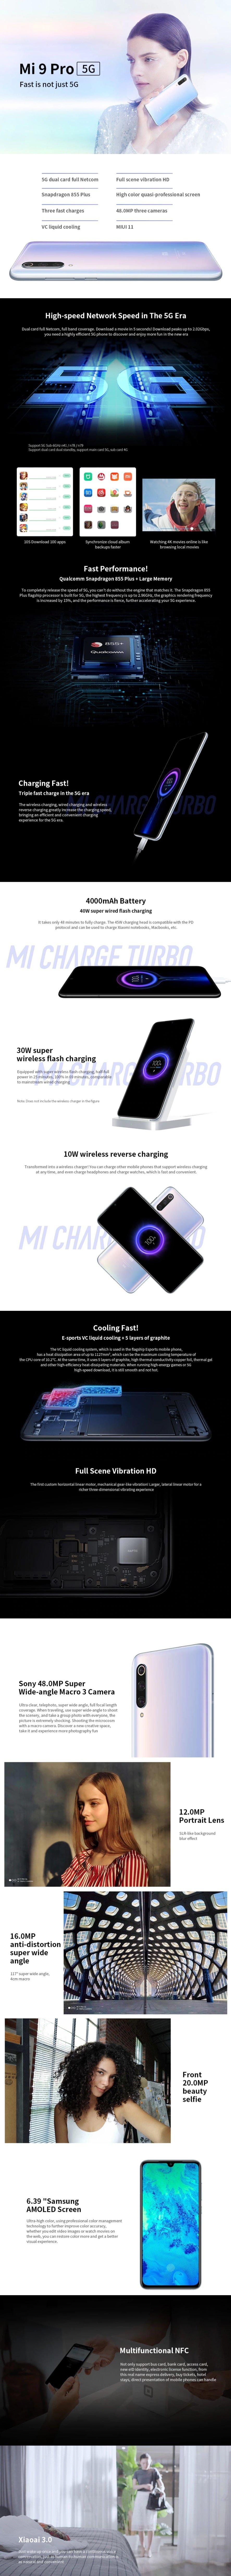 Xiaomi Mi 9 Pro 5G 5G Phablet specification